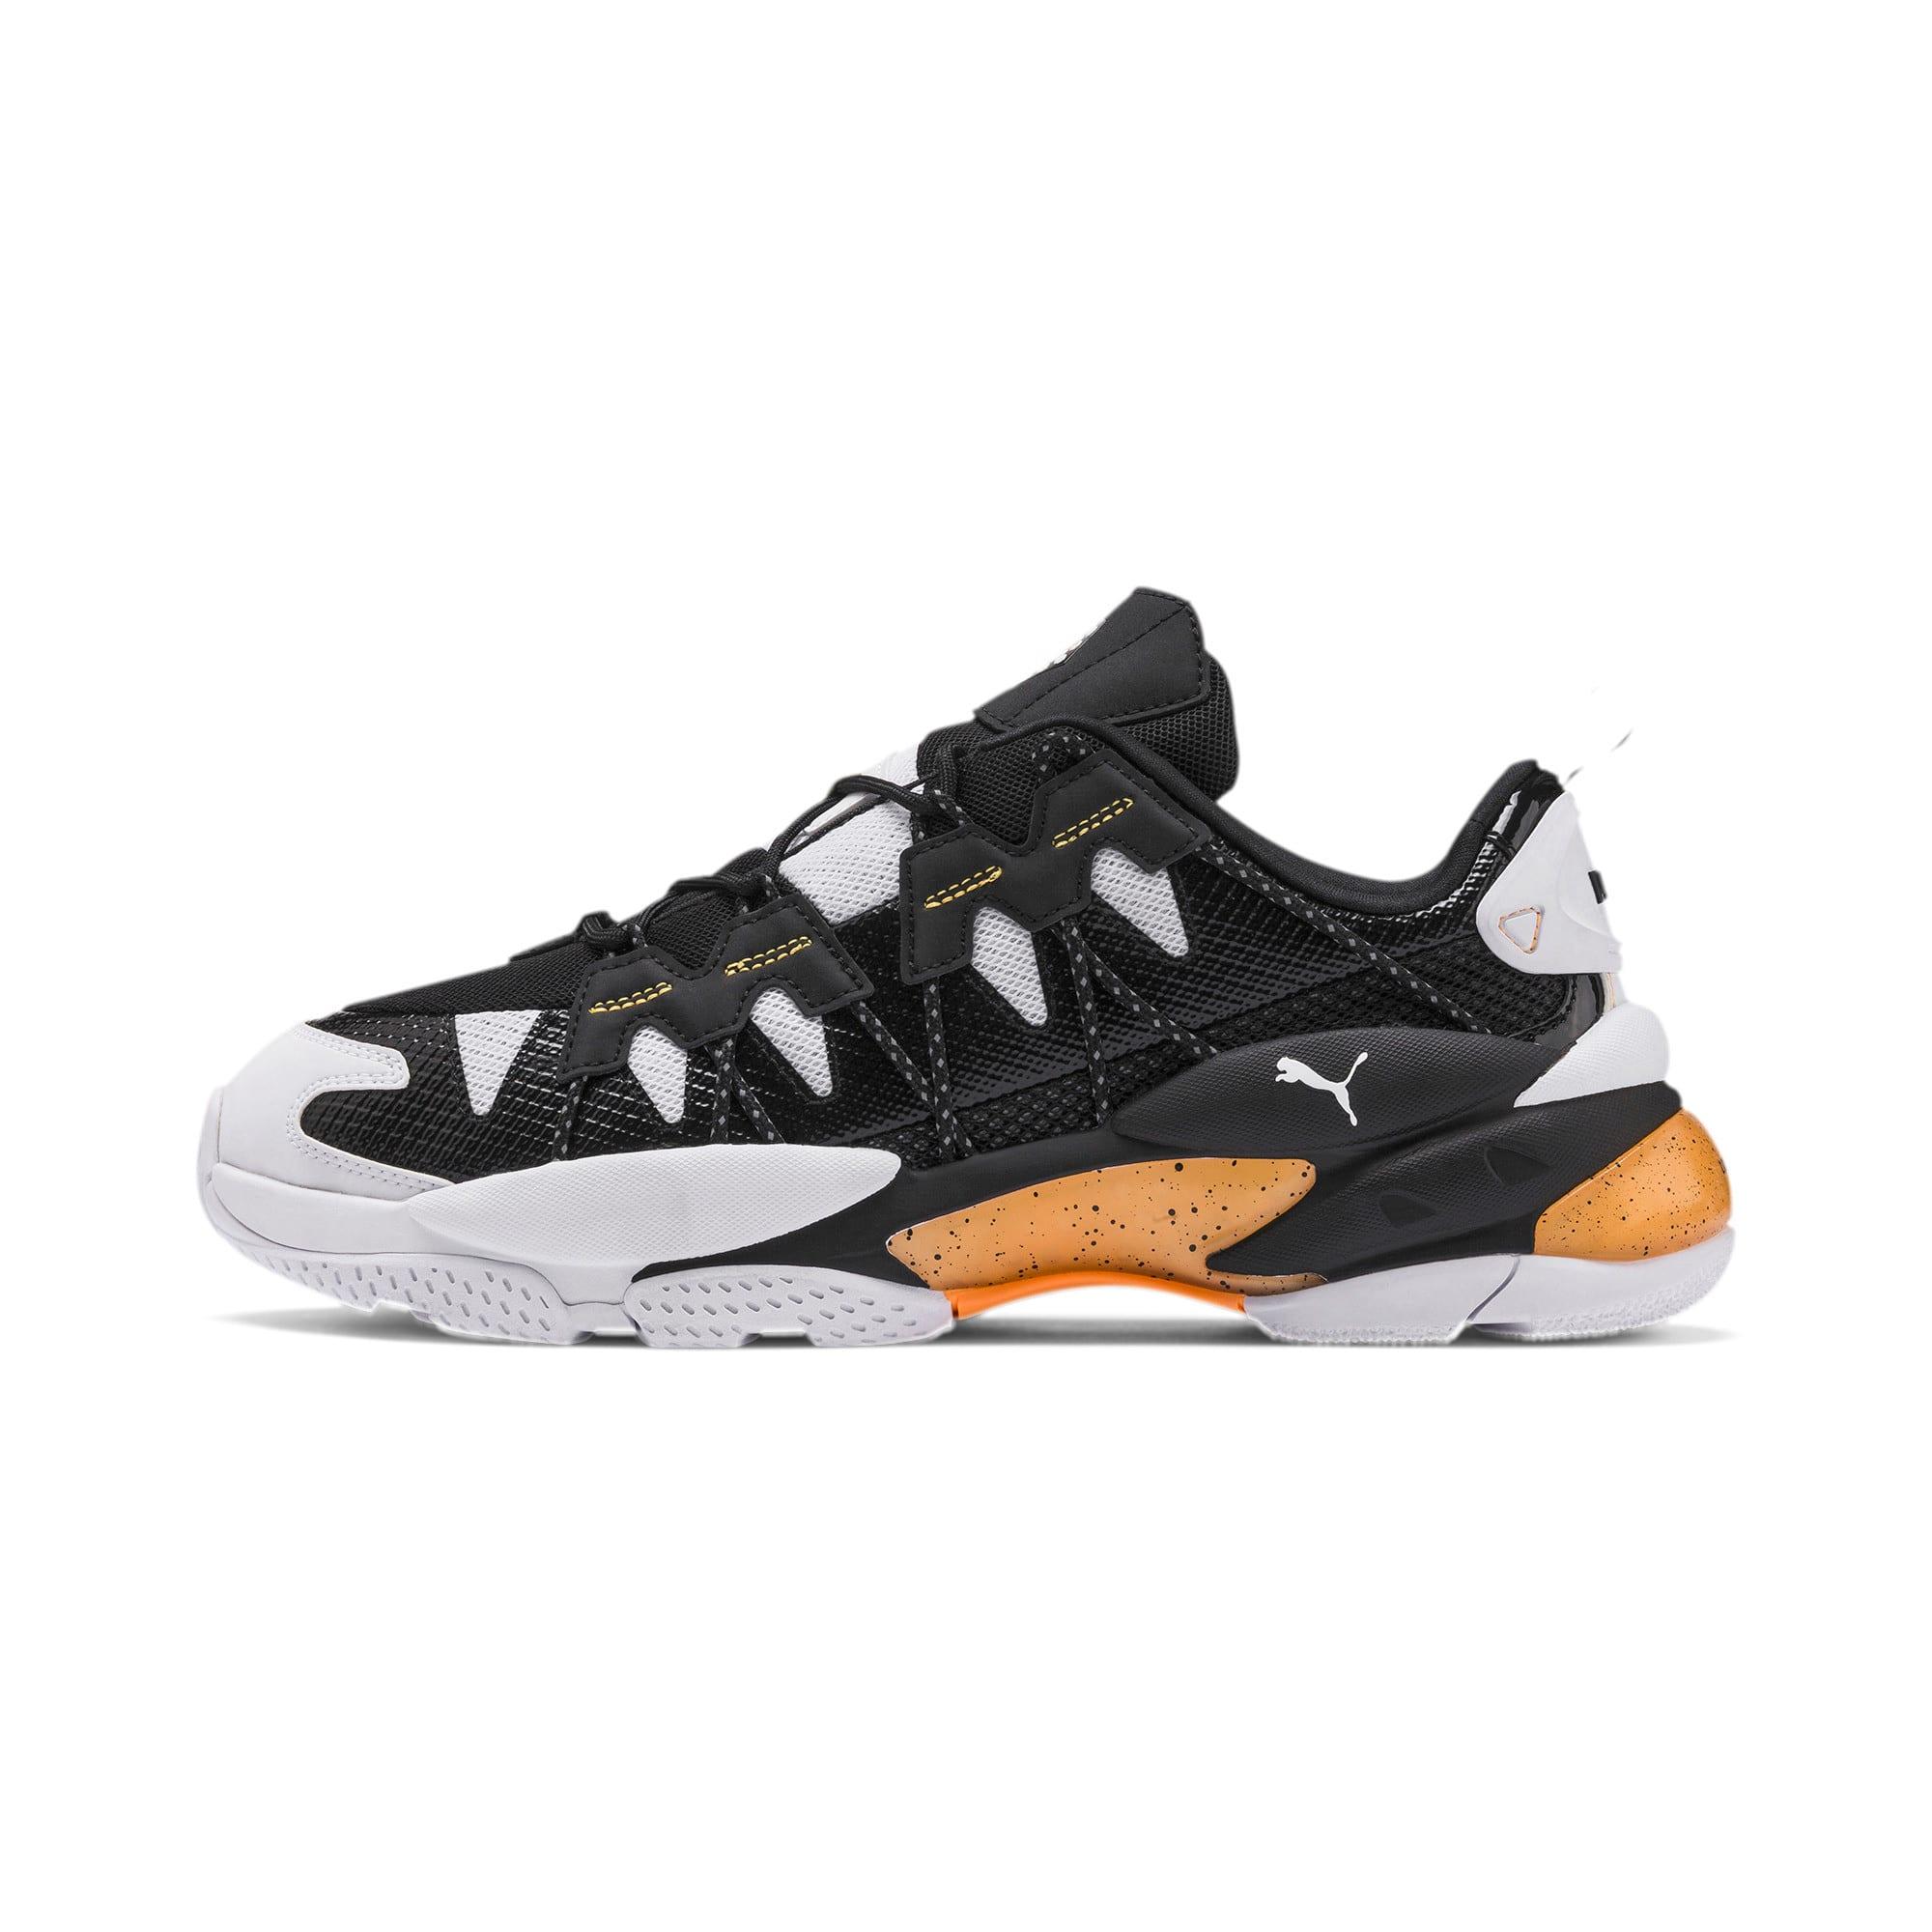 Thumbnail 1 of LQDCELL Omega Density Training Shoes, Puma White-Puma Black, medium